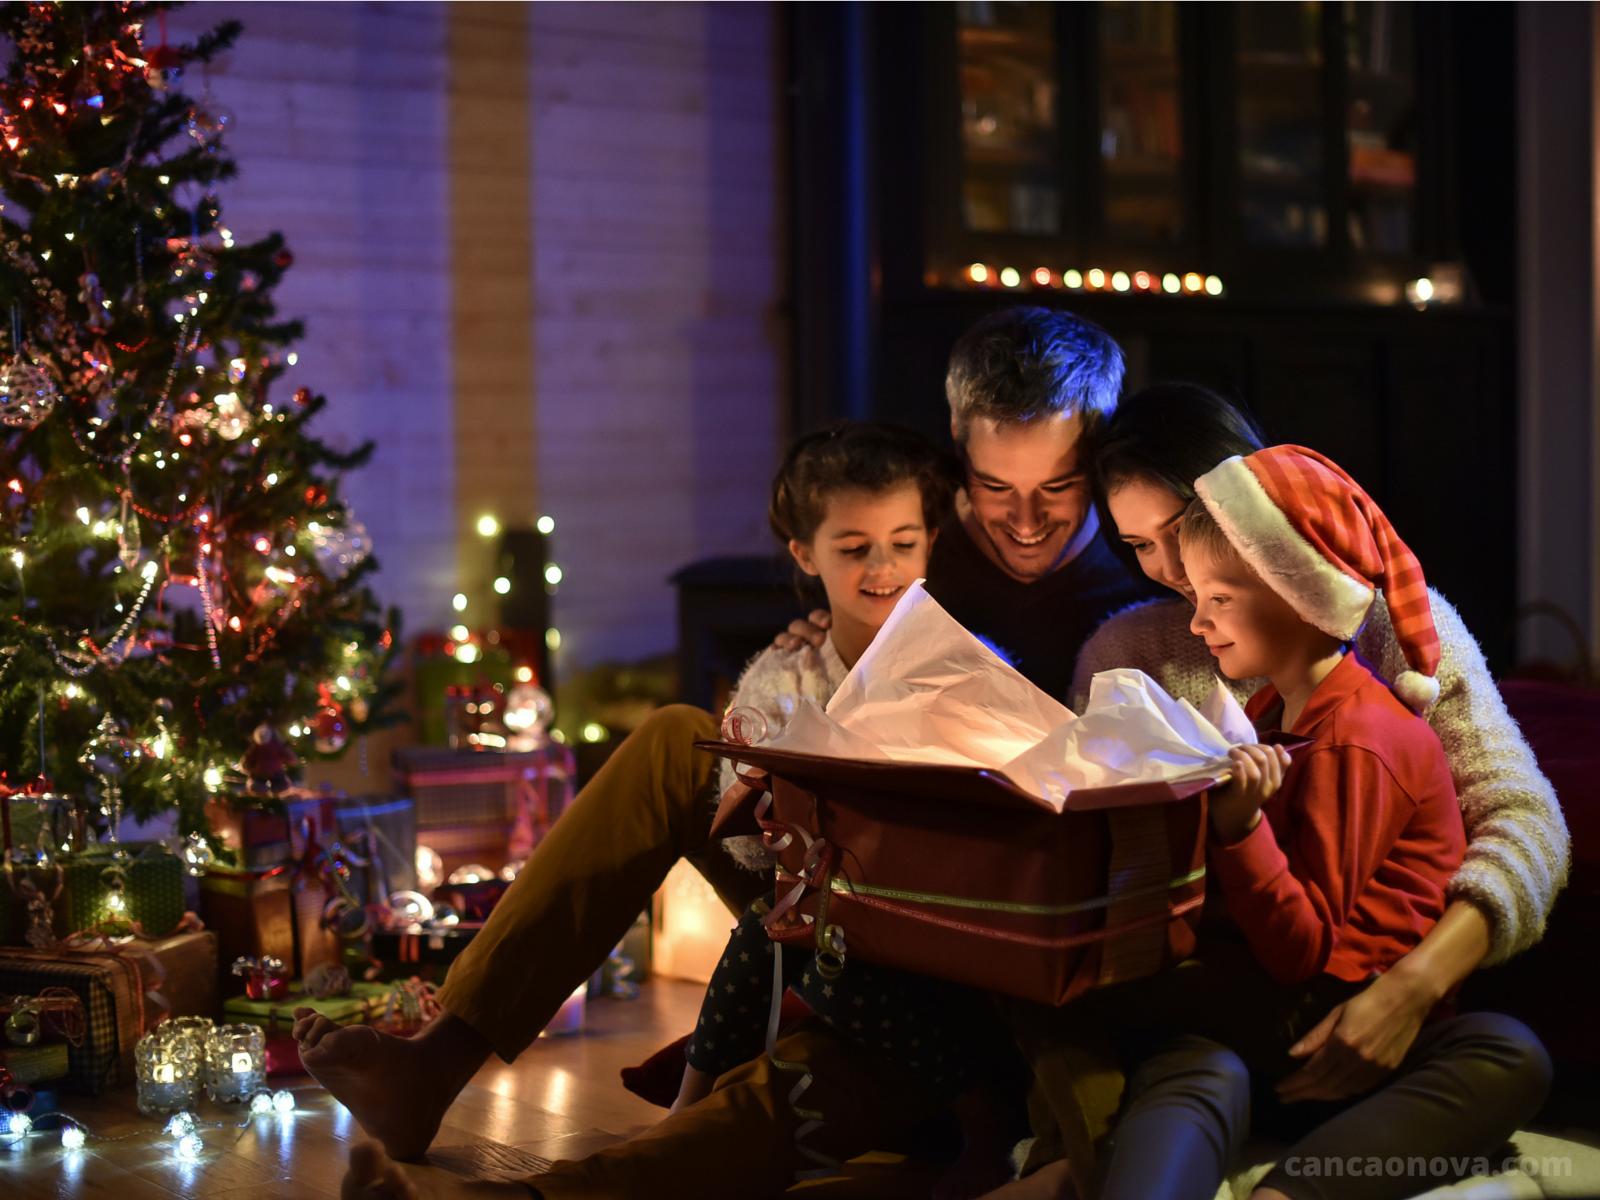 Como ser luz no Natal - 1200 x 1600(1)